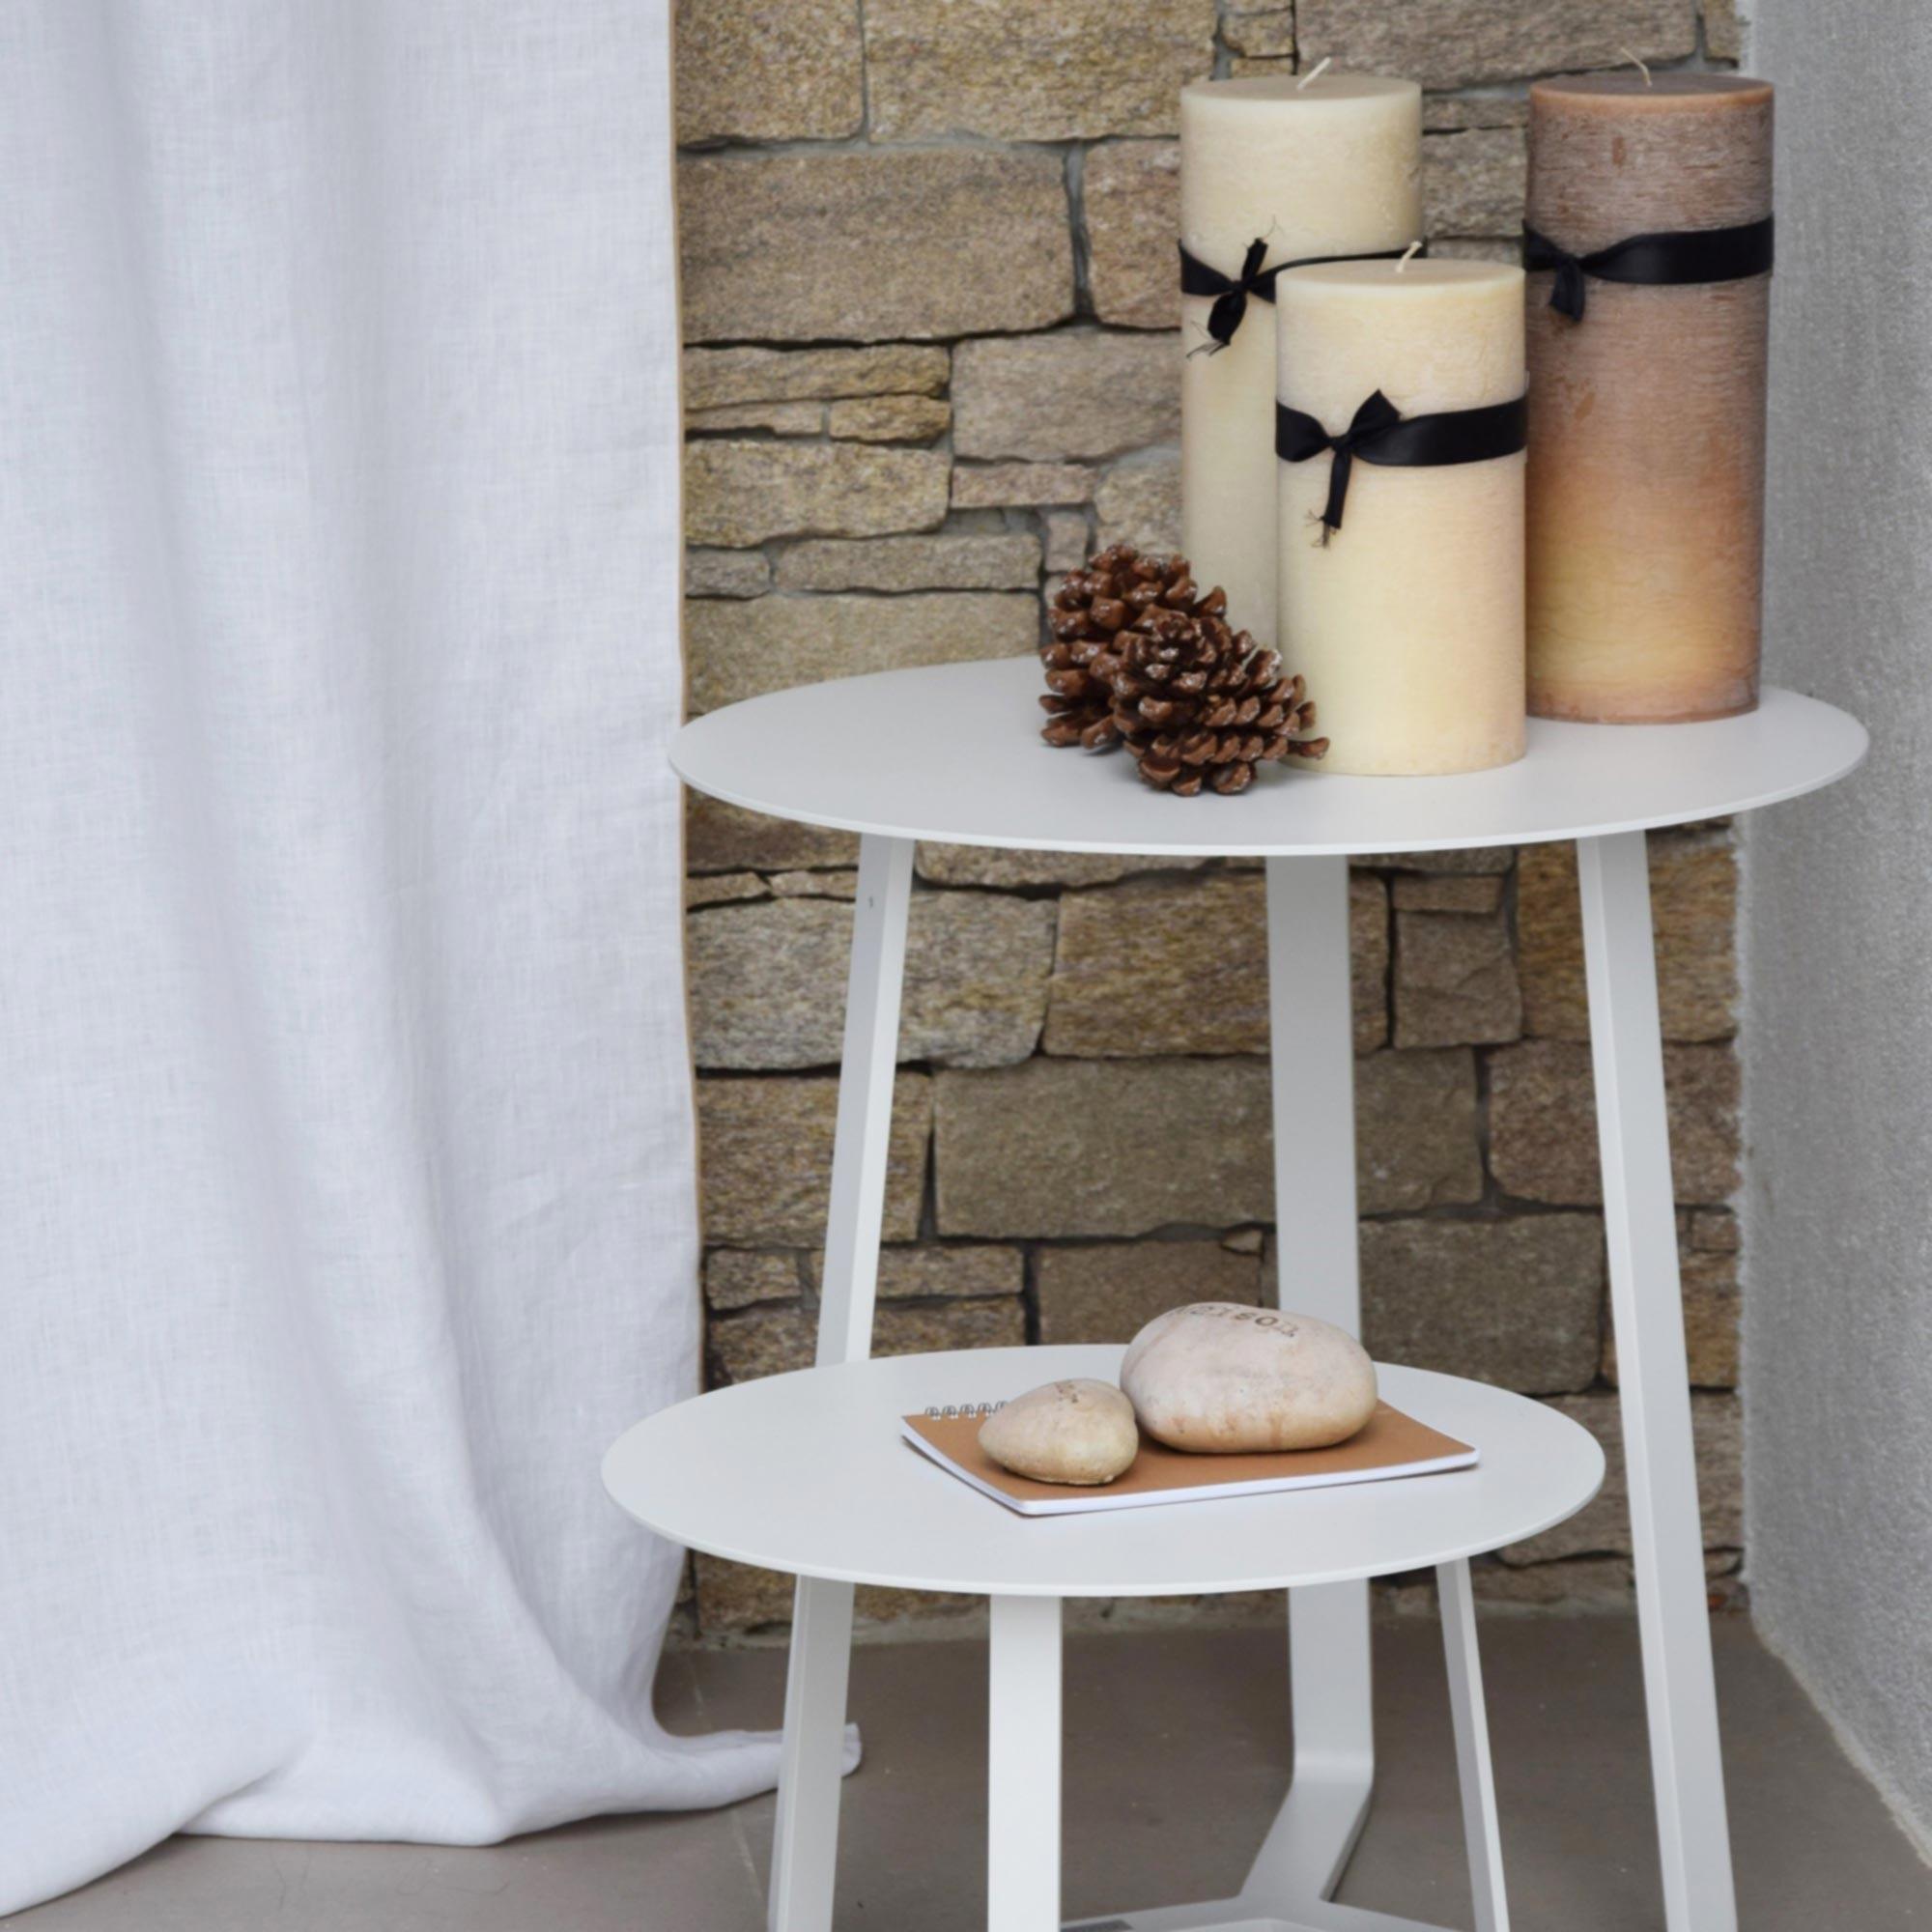 rideau en lin lav blanc bourdon naturel. Black Bedroom Furniture Sets. Home Design Ideas